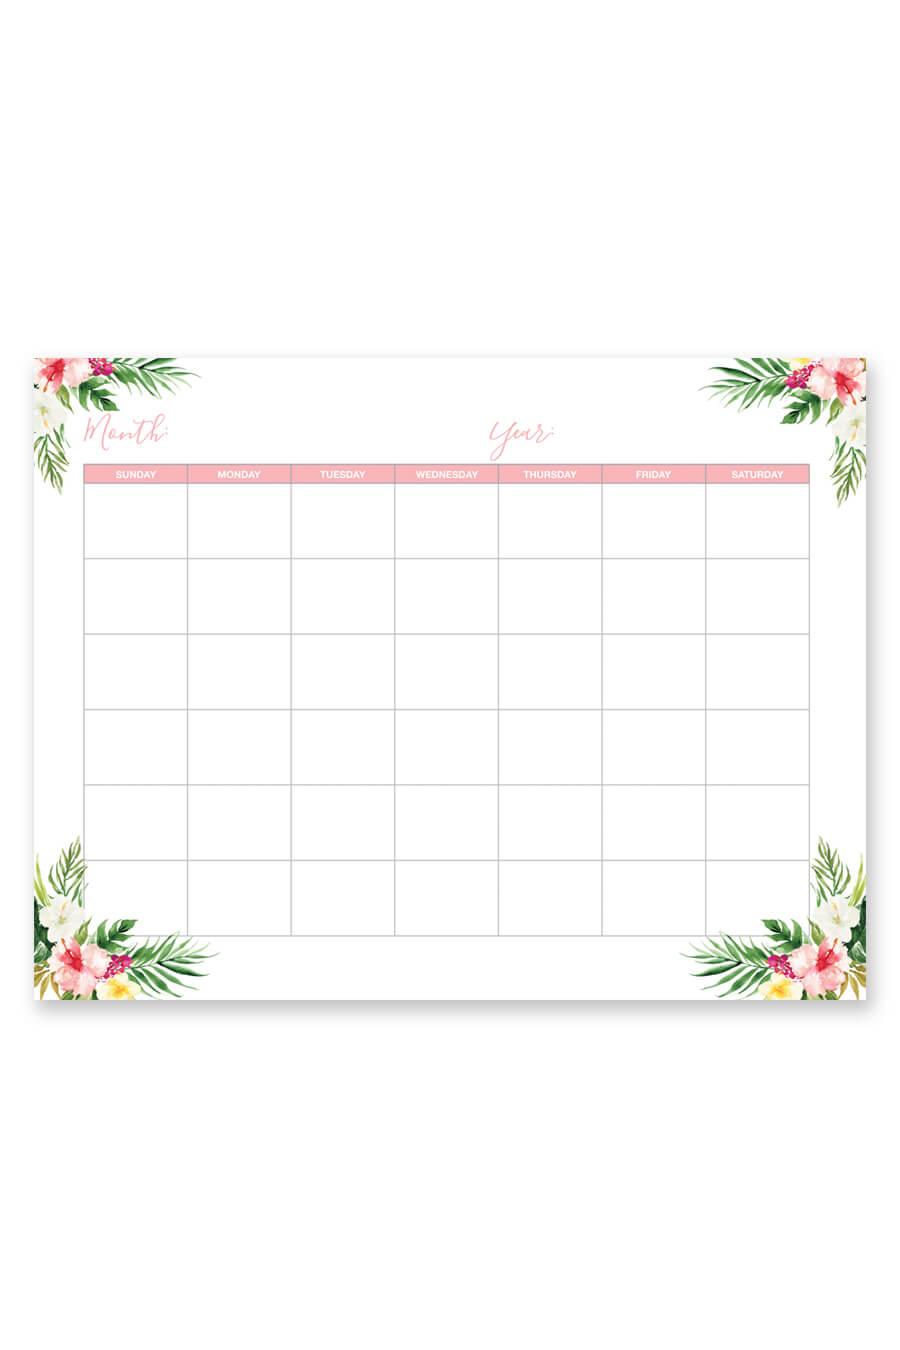 Tropical Blank Printable Calendar  Chicfetti with regard to Empty Calendar Printable